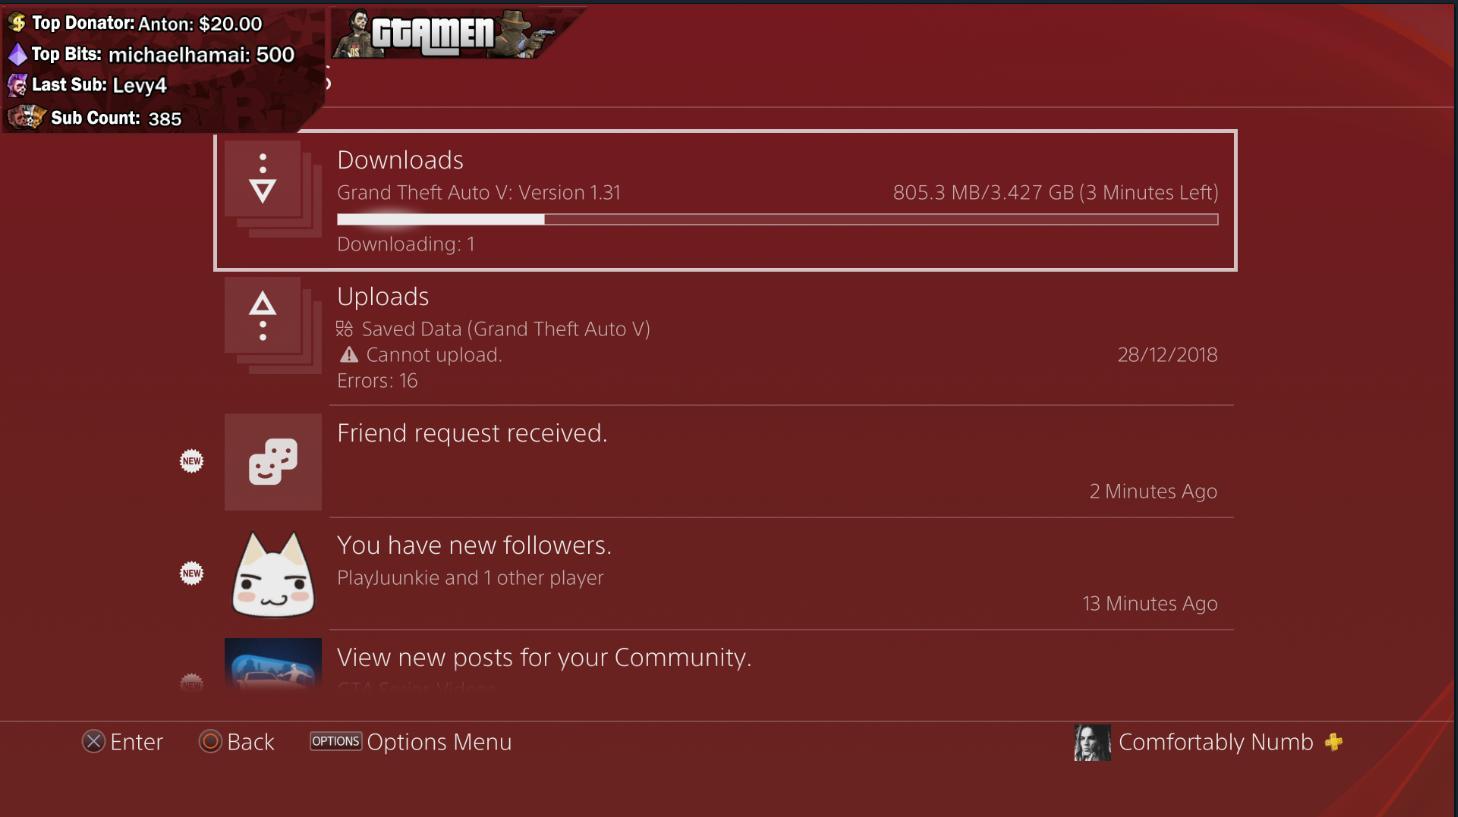 The GTA Online Casino update is now live - RockstarINTEL